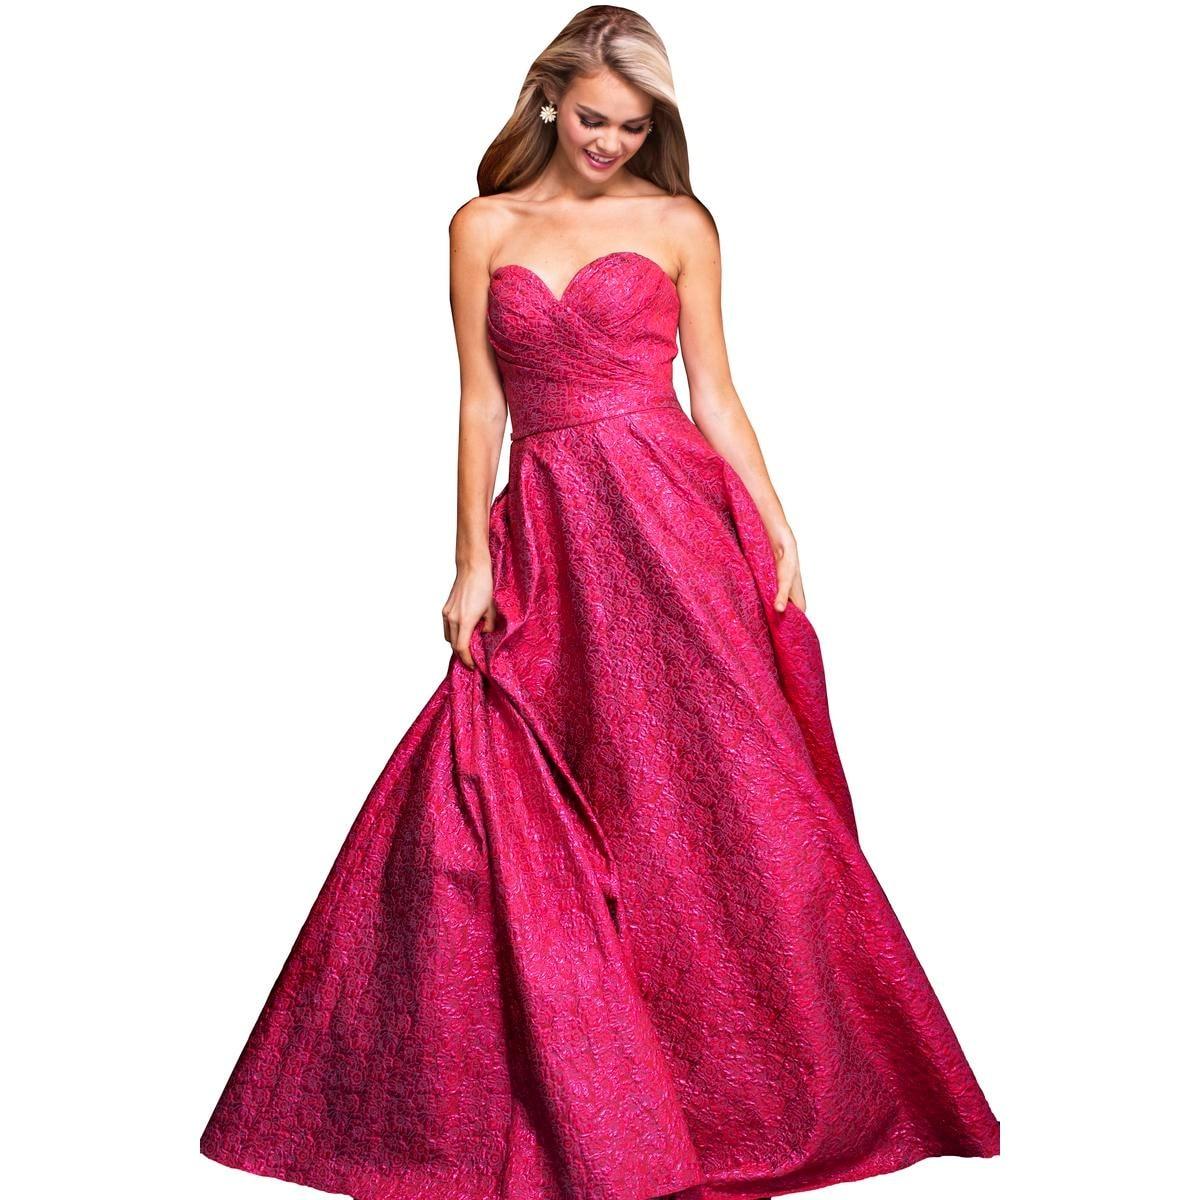 904c6905afb Jovani Red Evening Dresses - Data Dynamic AG